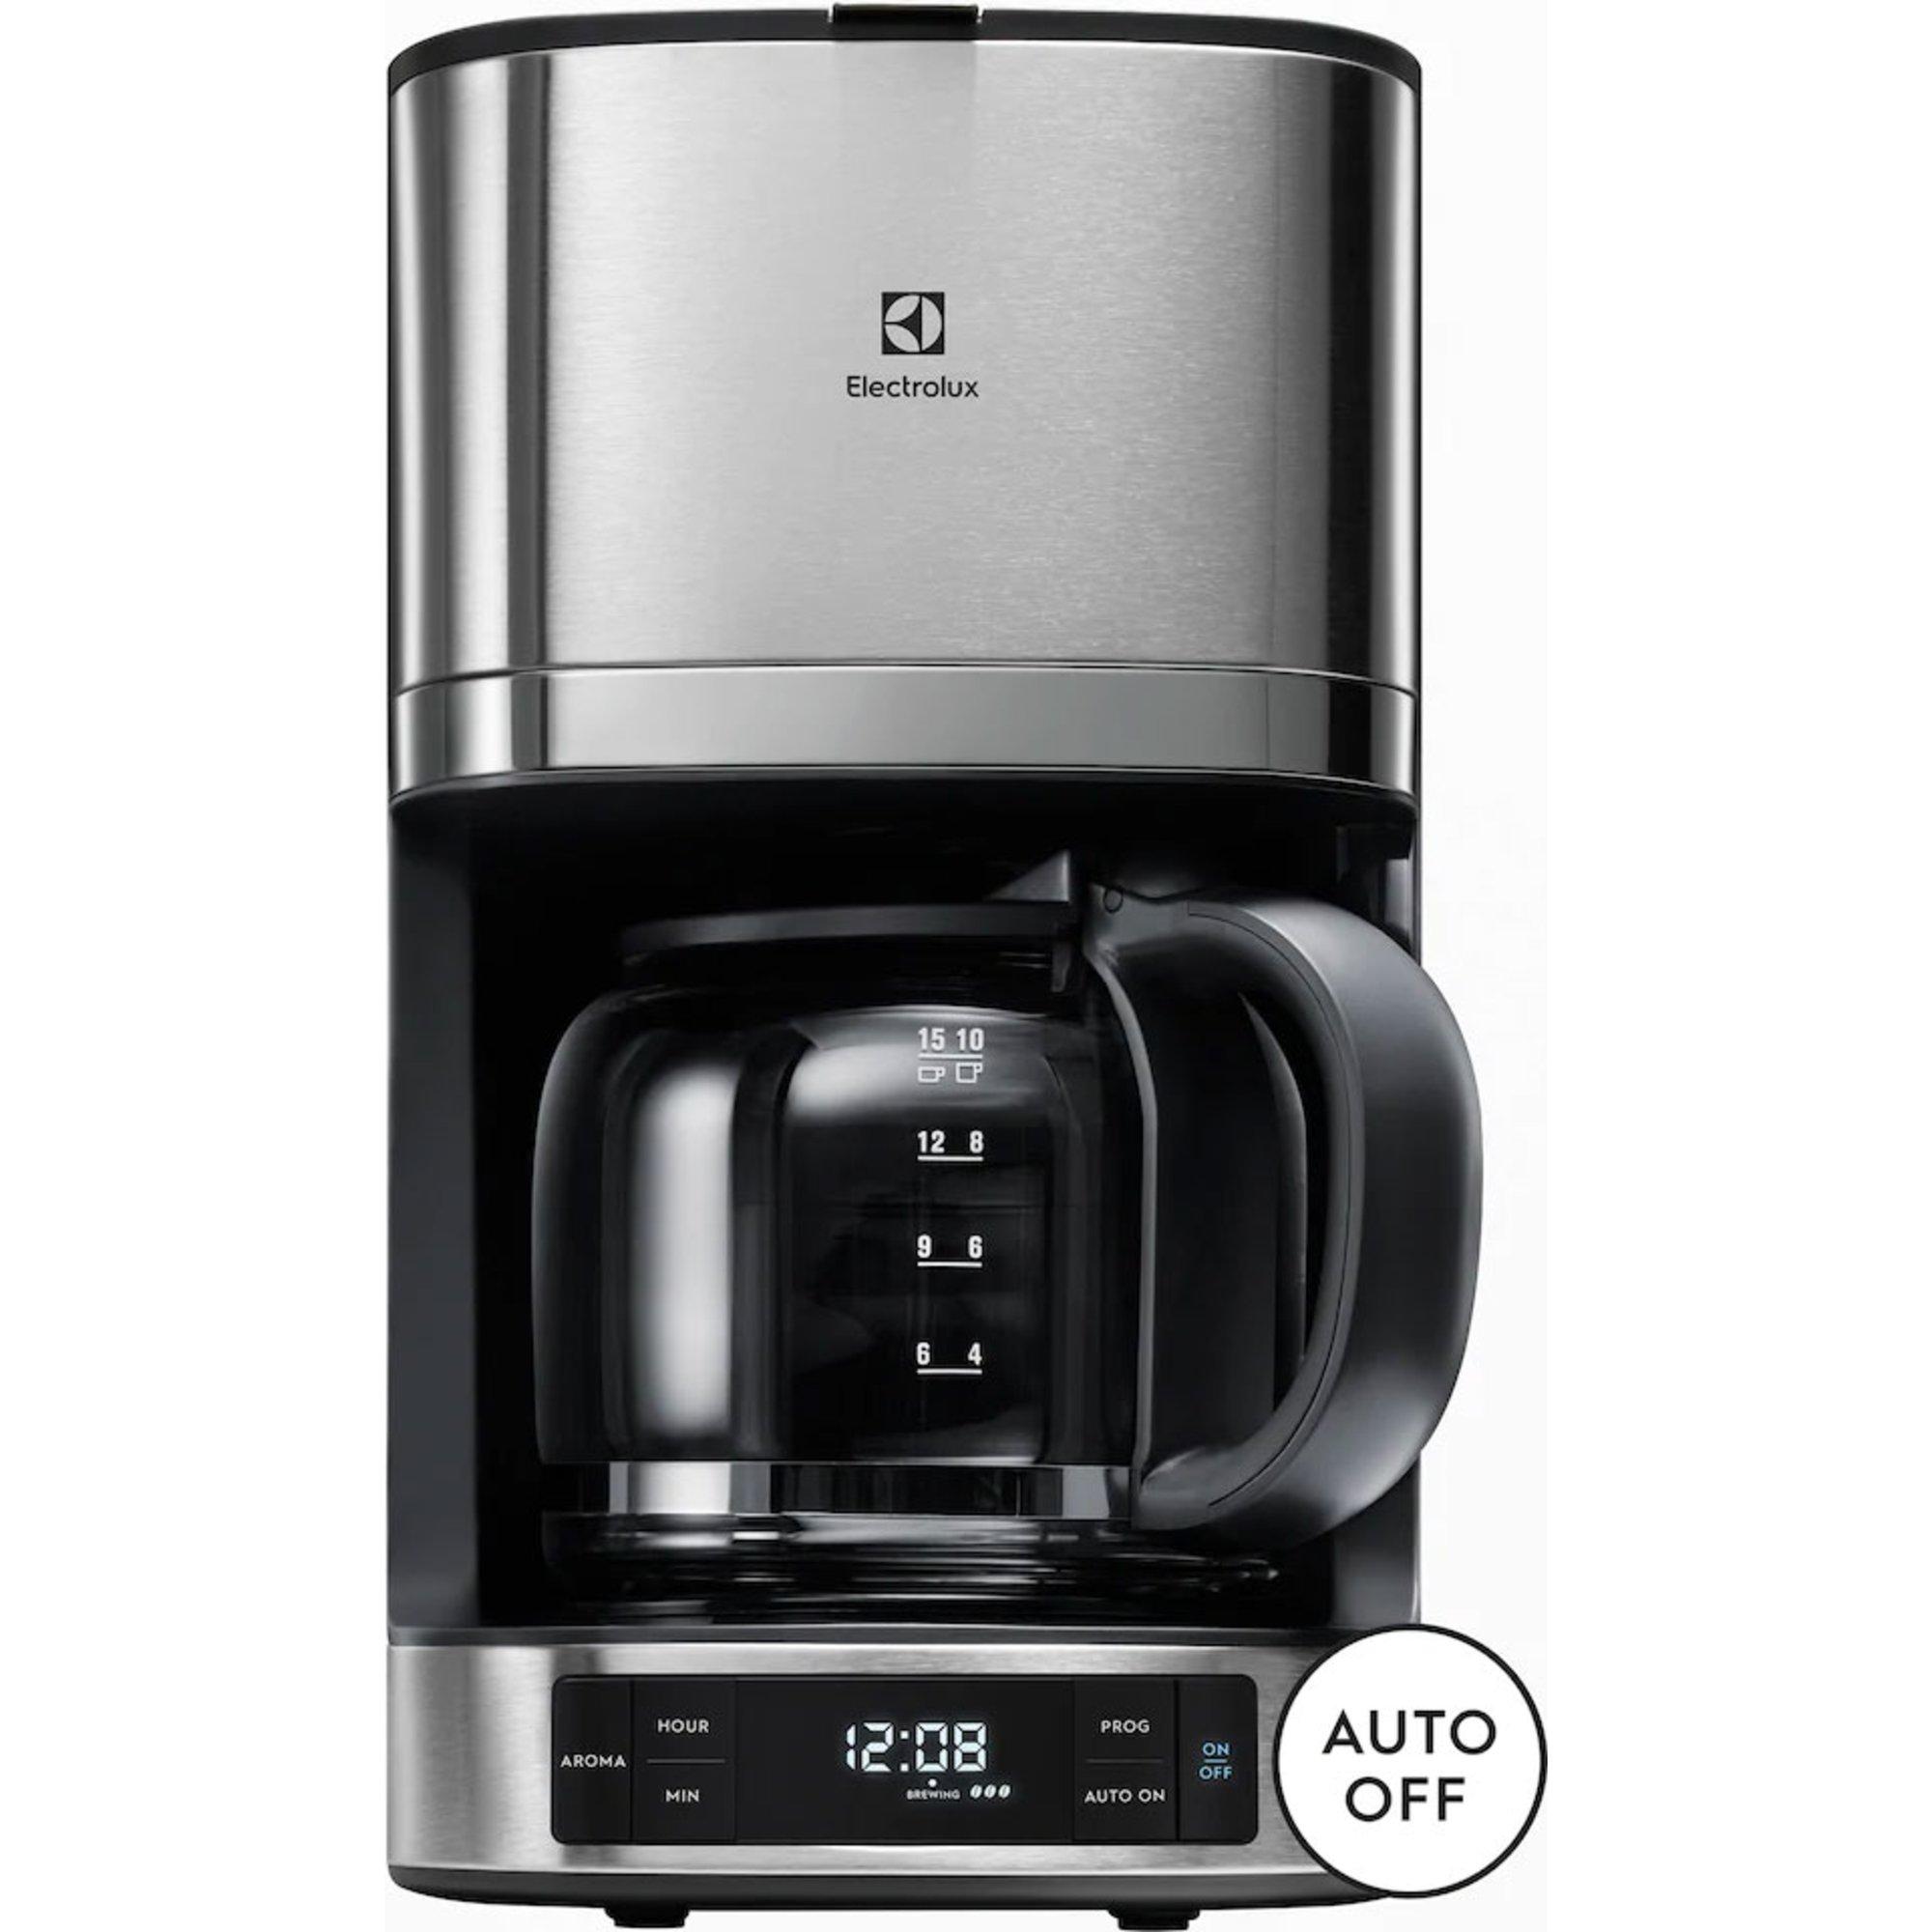 Electrolux EKF7700 kaffebryggare